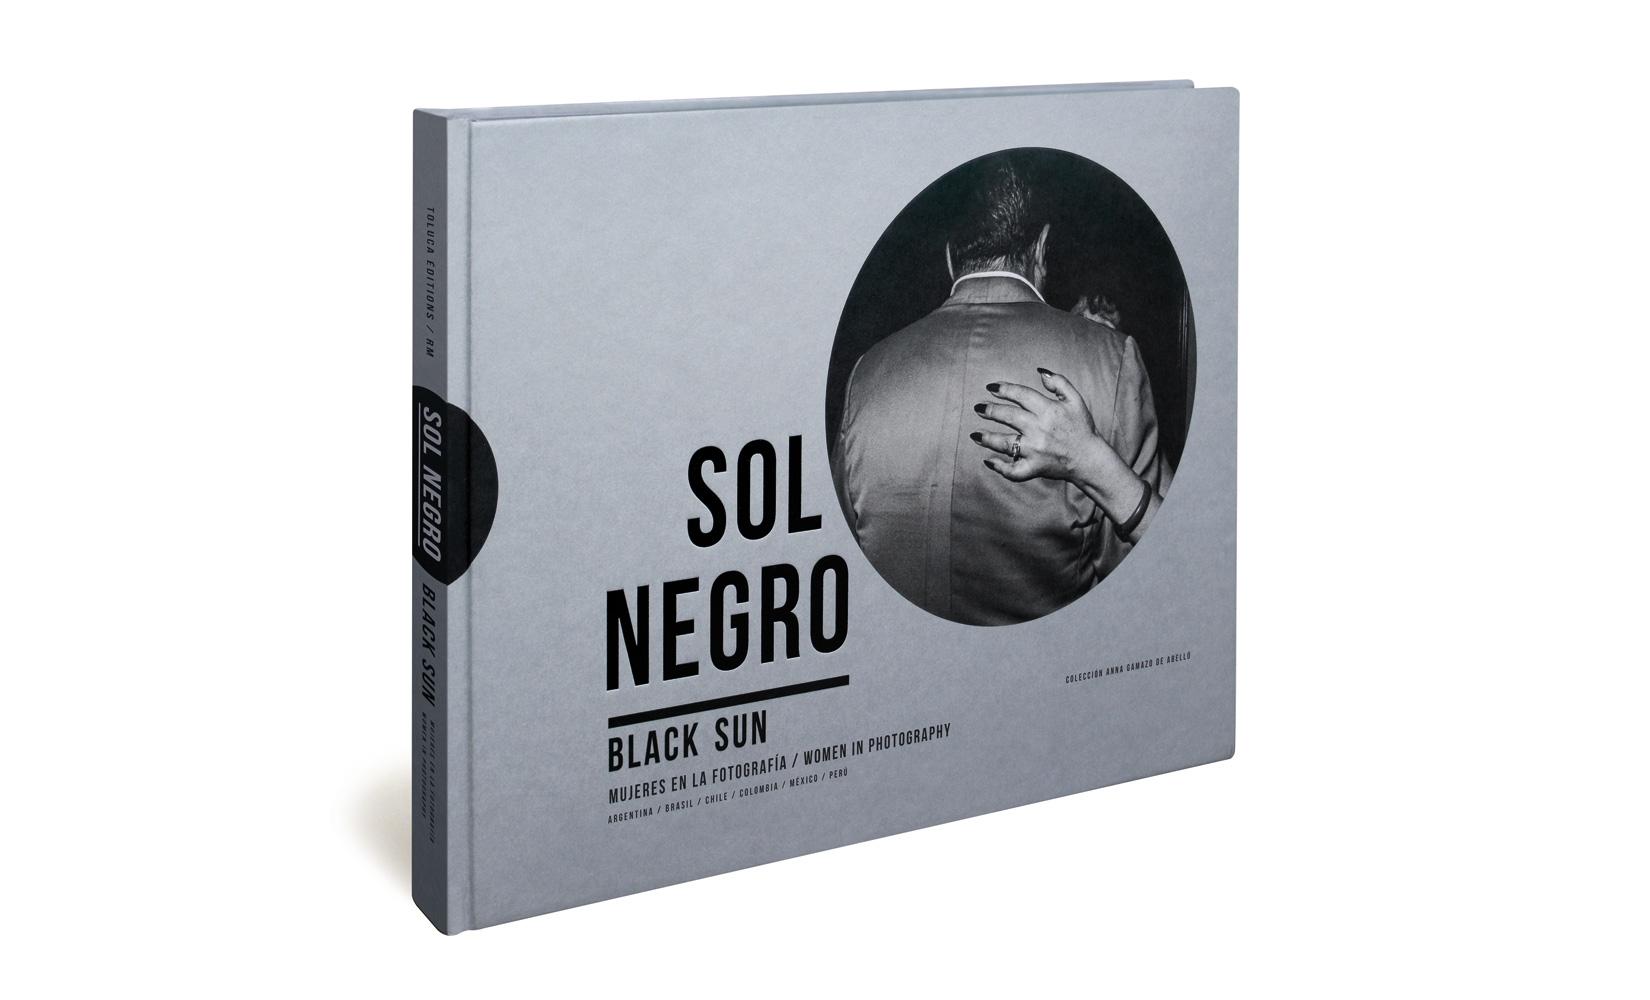 SOL-NEGRO-TOLUCA-STUDIO-OLIVIER-ANDREOTTI-01.jpg